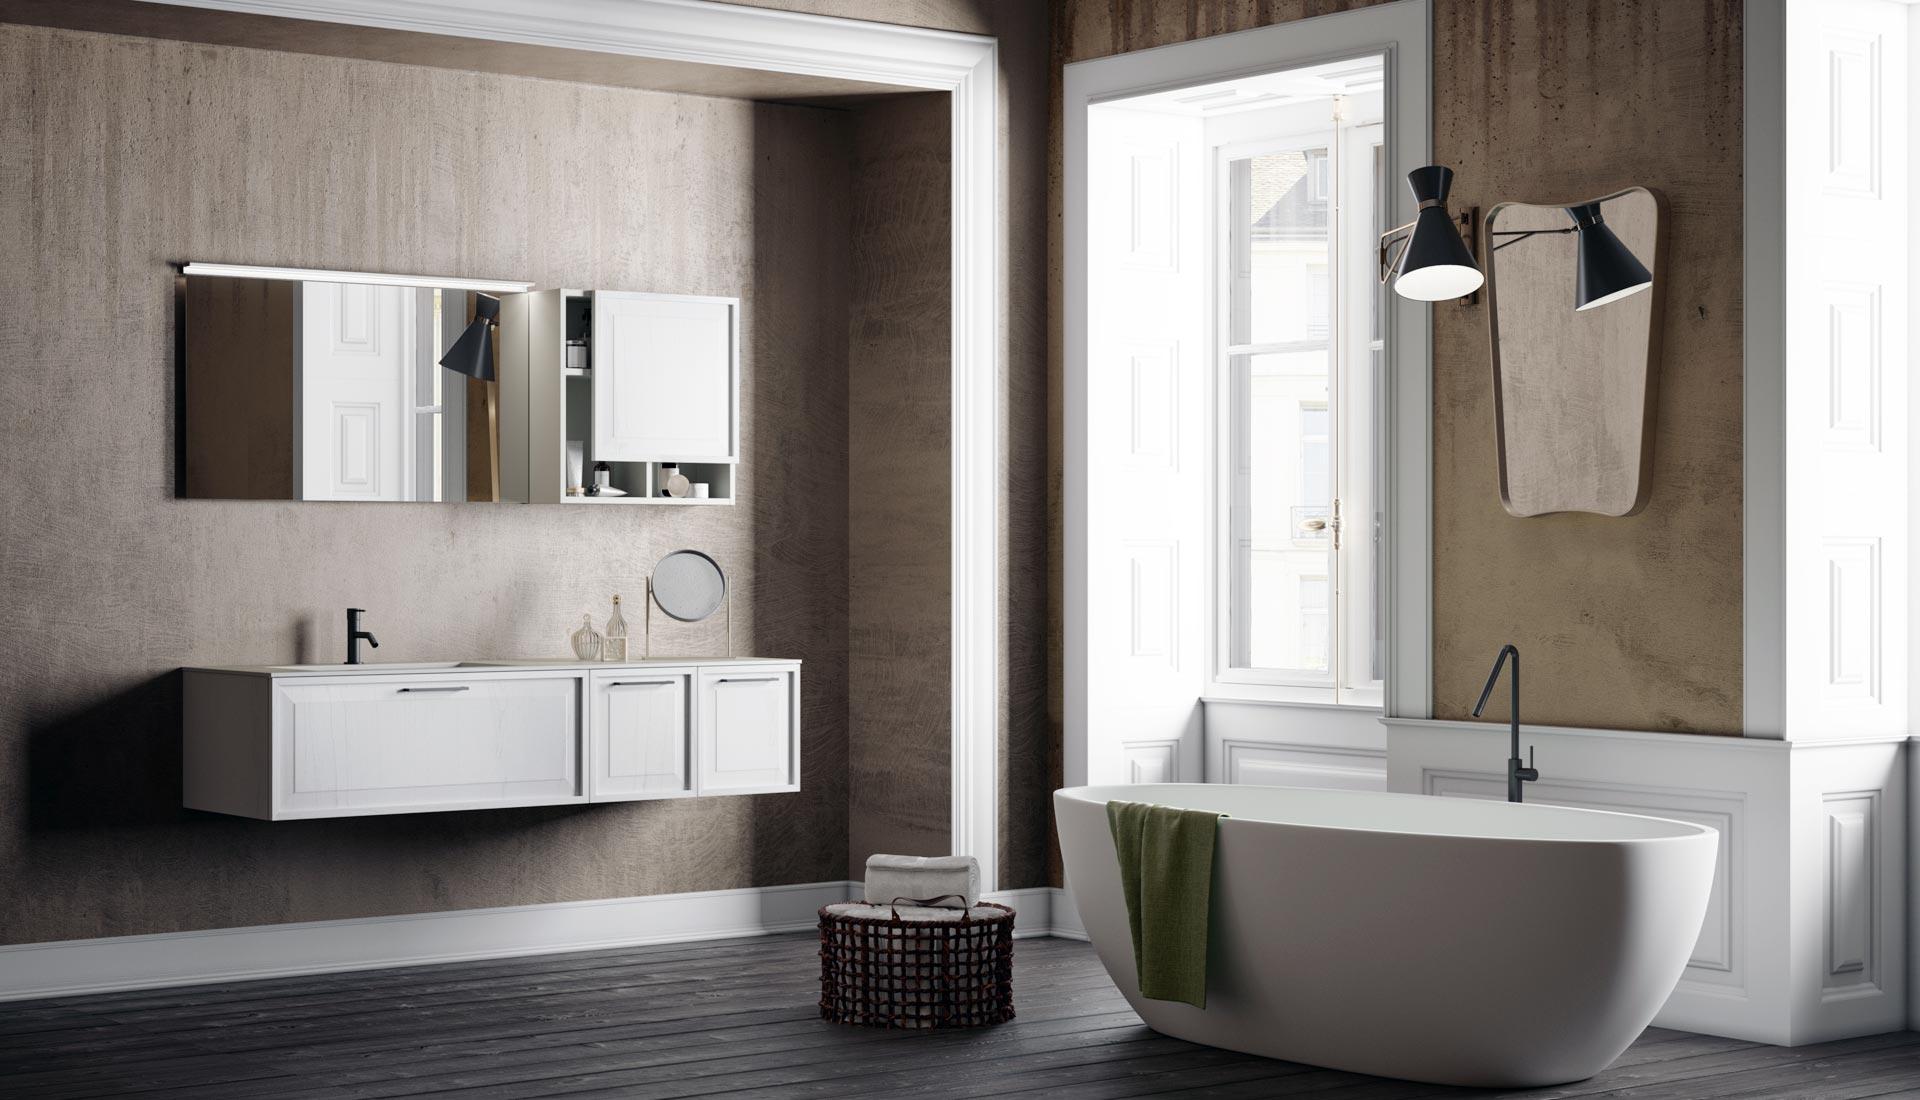 roma - Arredo bagno classico in chiave moderna